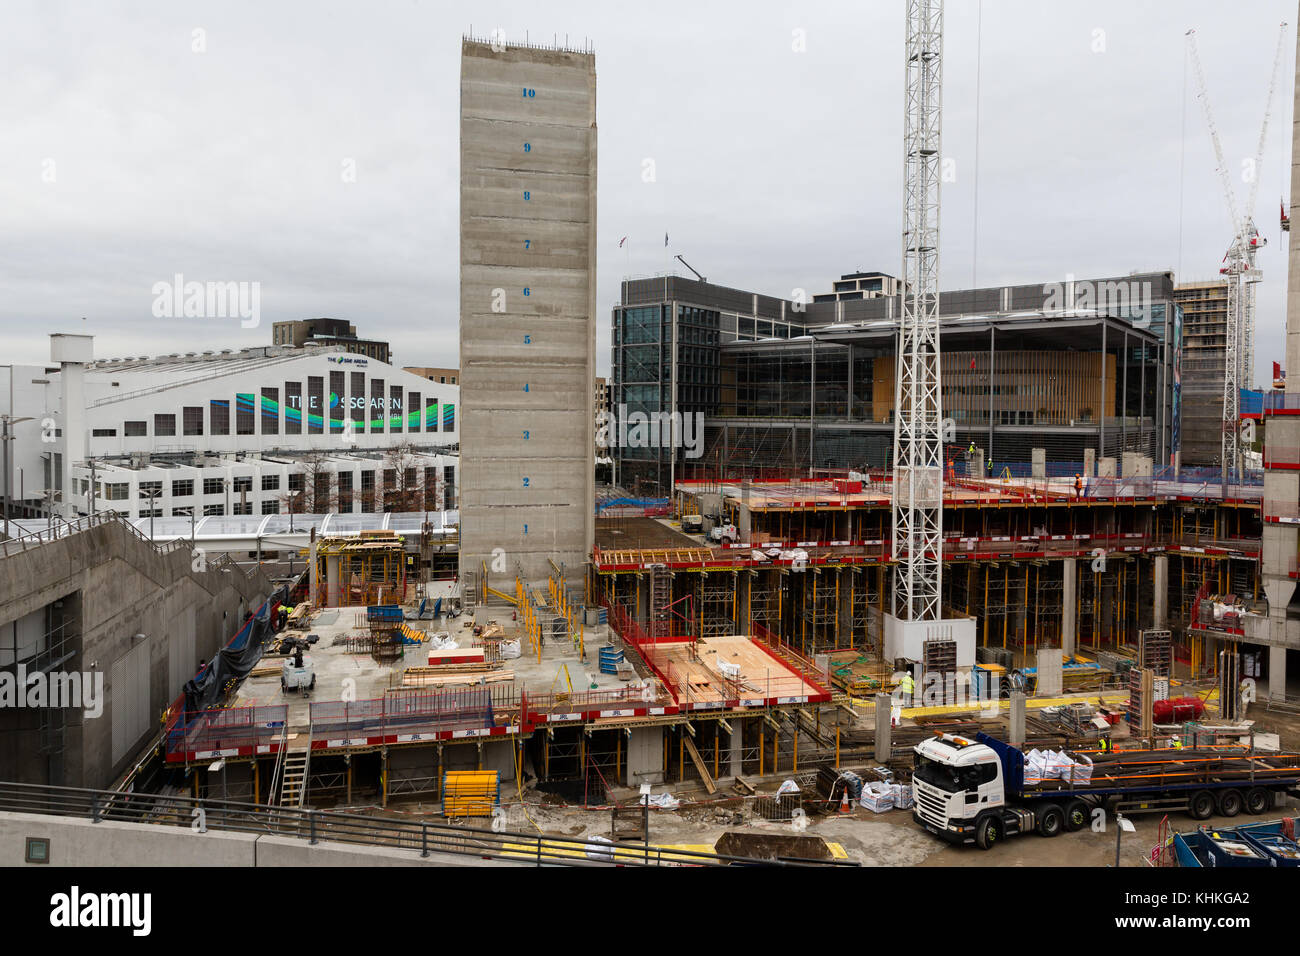 Wembley Park - Quintain £140 million development scheme transforms the area around Wembley Stadium - Stock Image